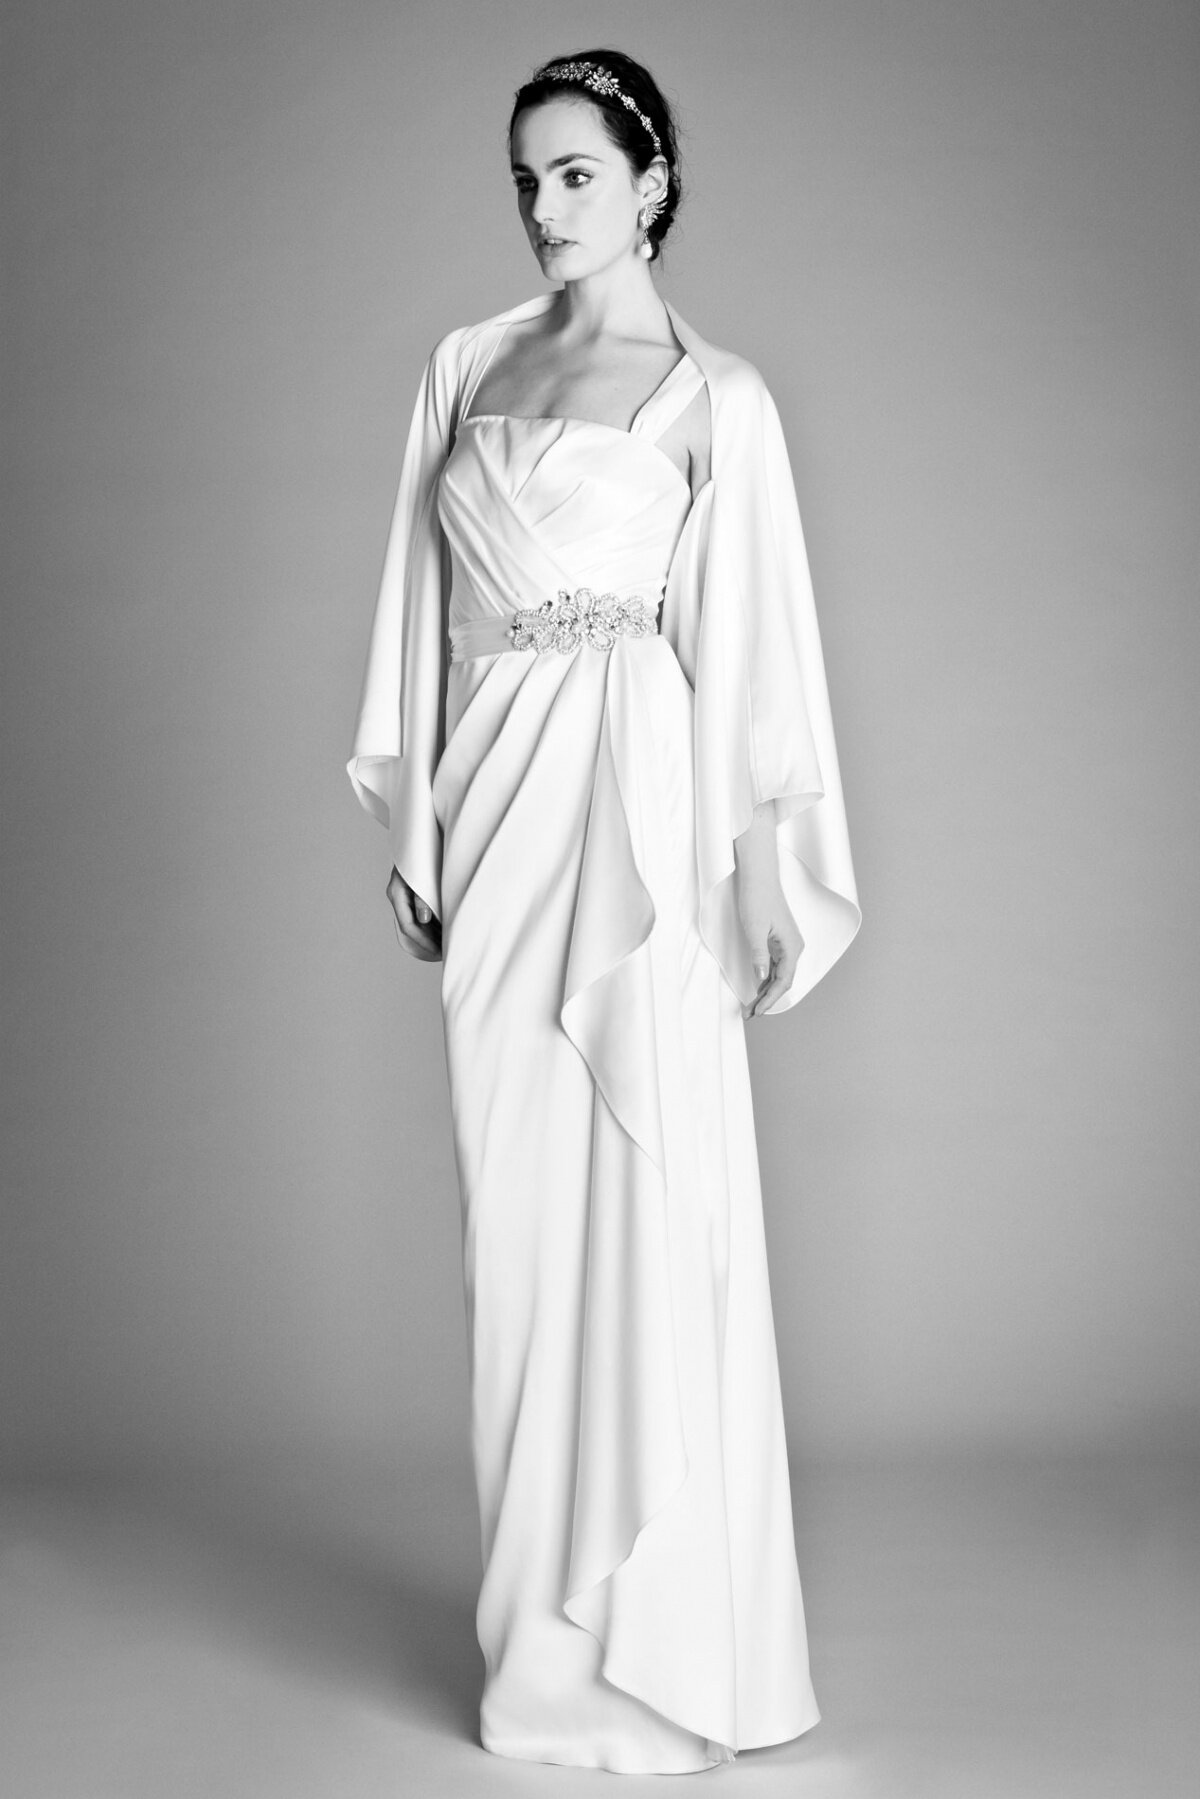 Wedding dresses for second time brides pictures ideas for Wedding dresses for second time brides